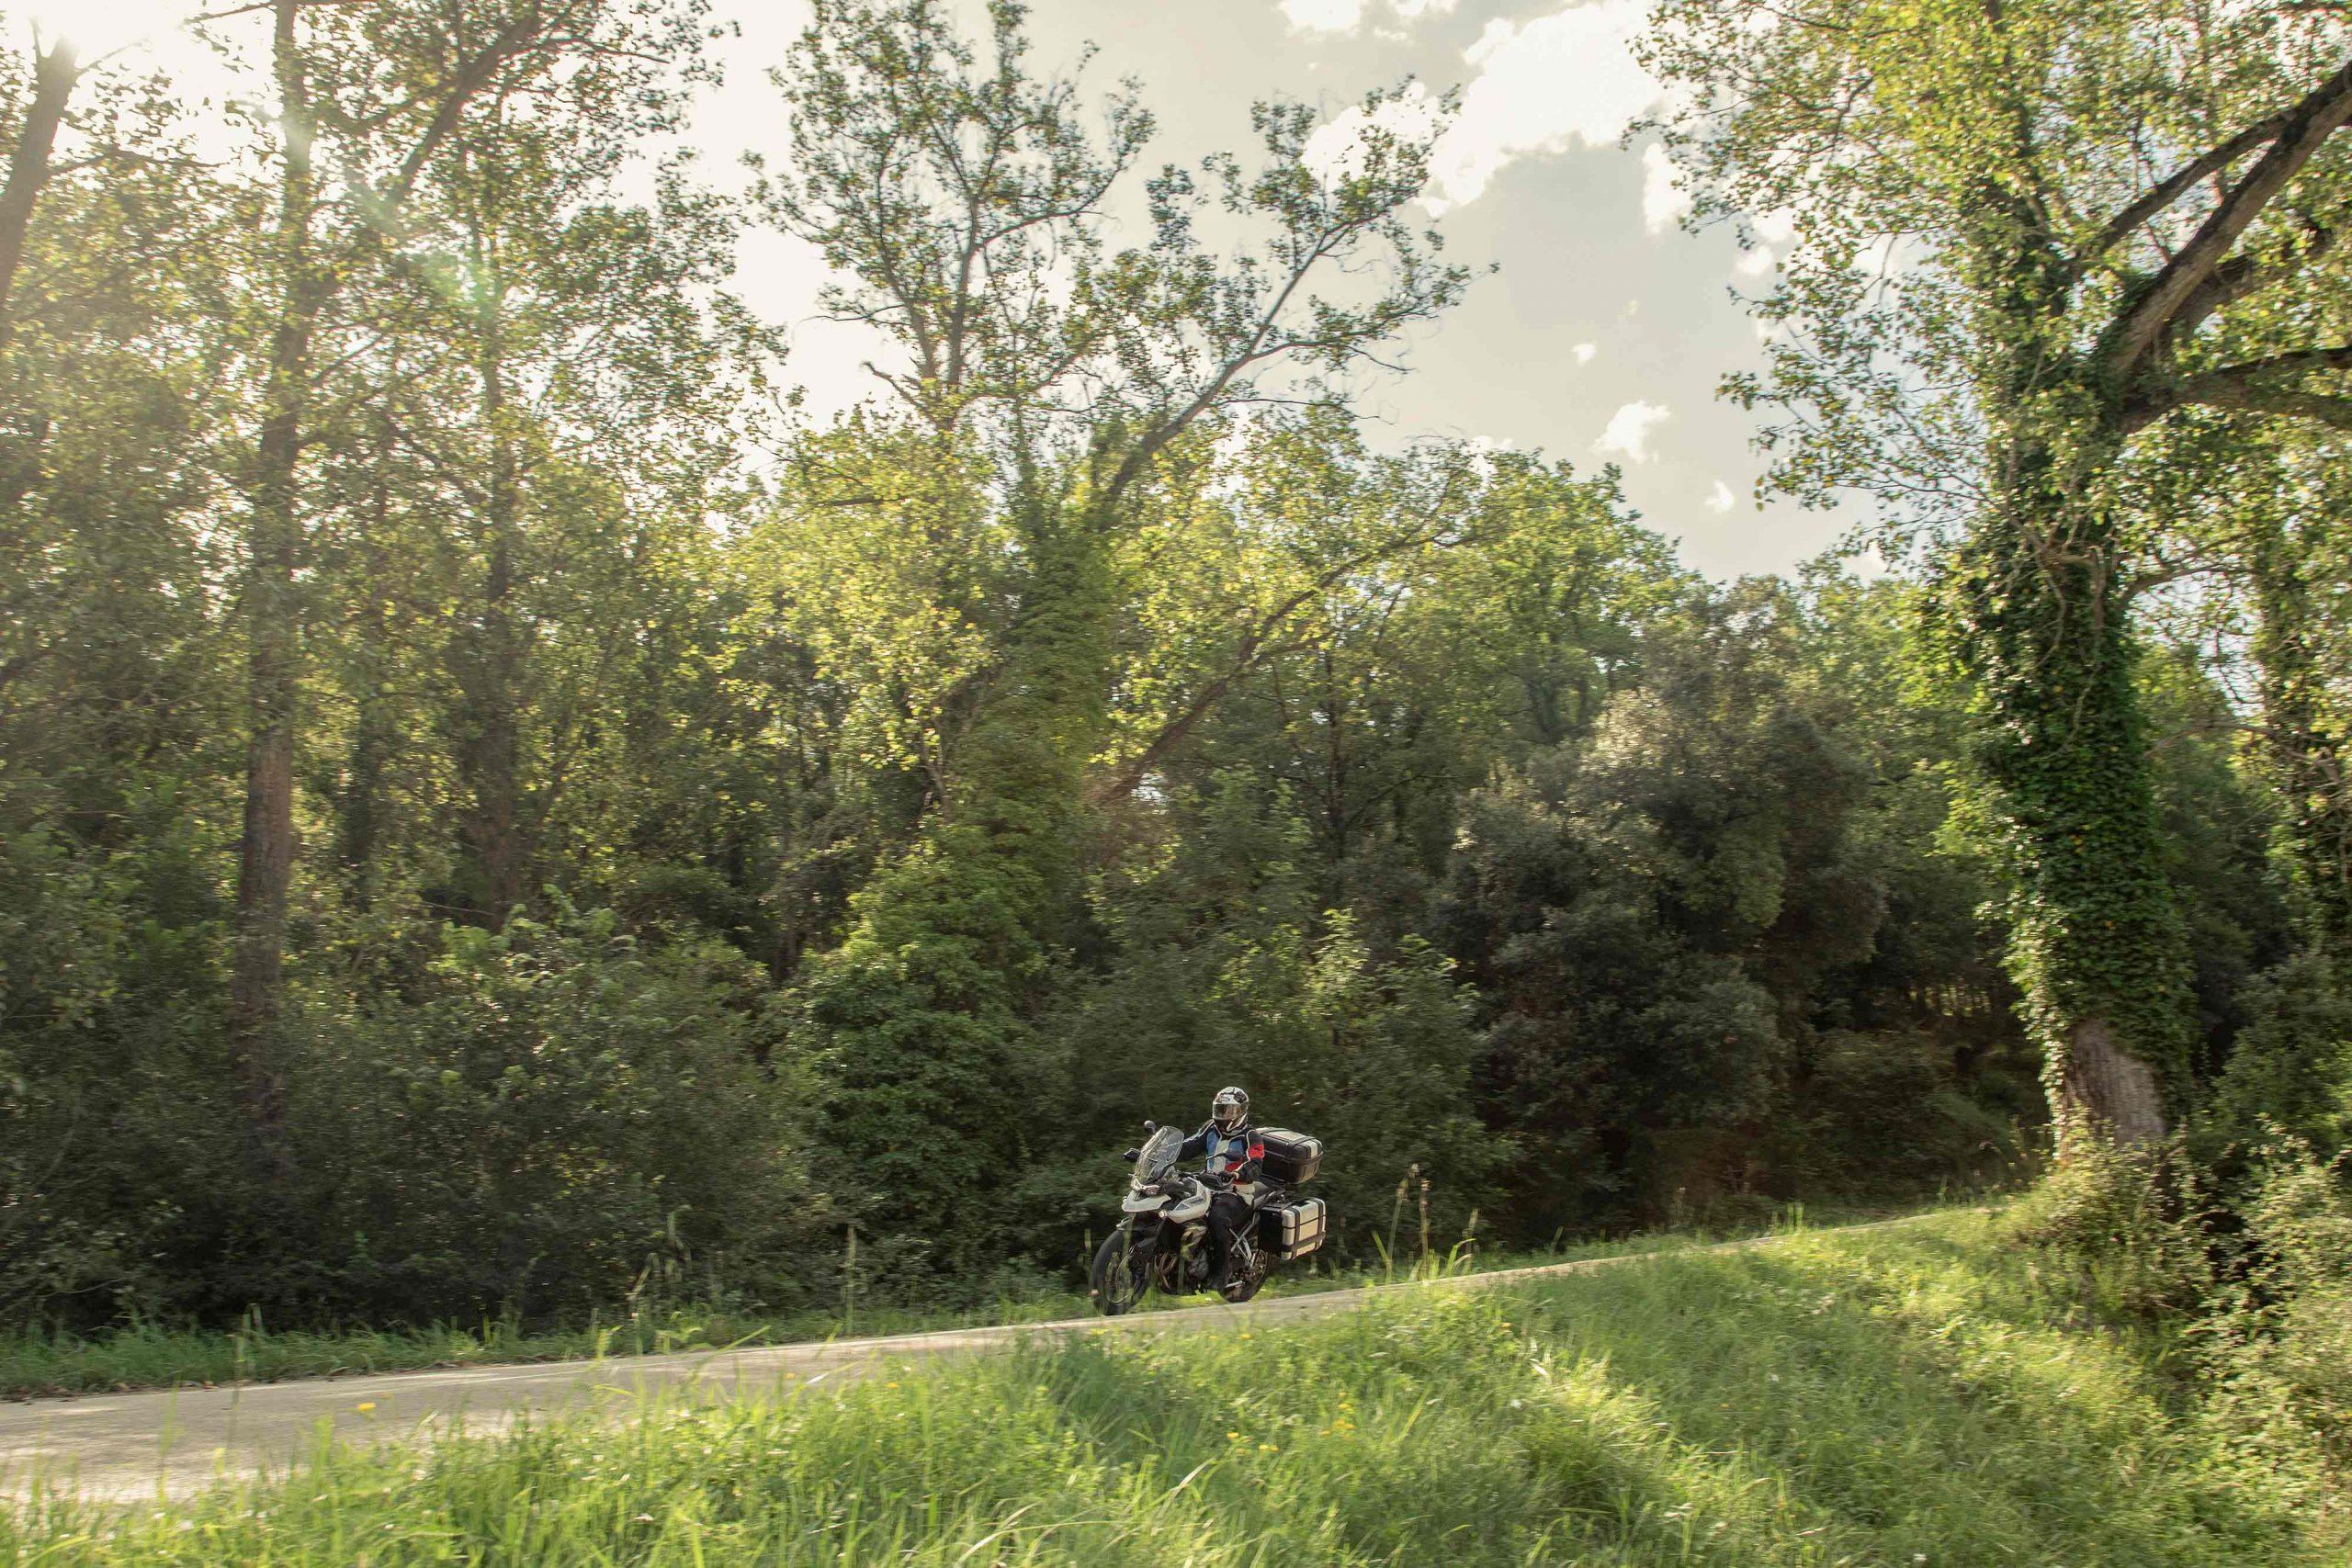 007_TriumphTiger-motosnet-mariapujol-fotografobarcelona